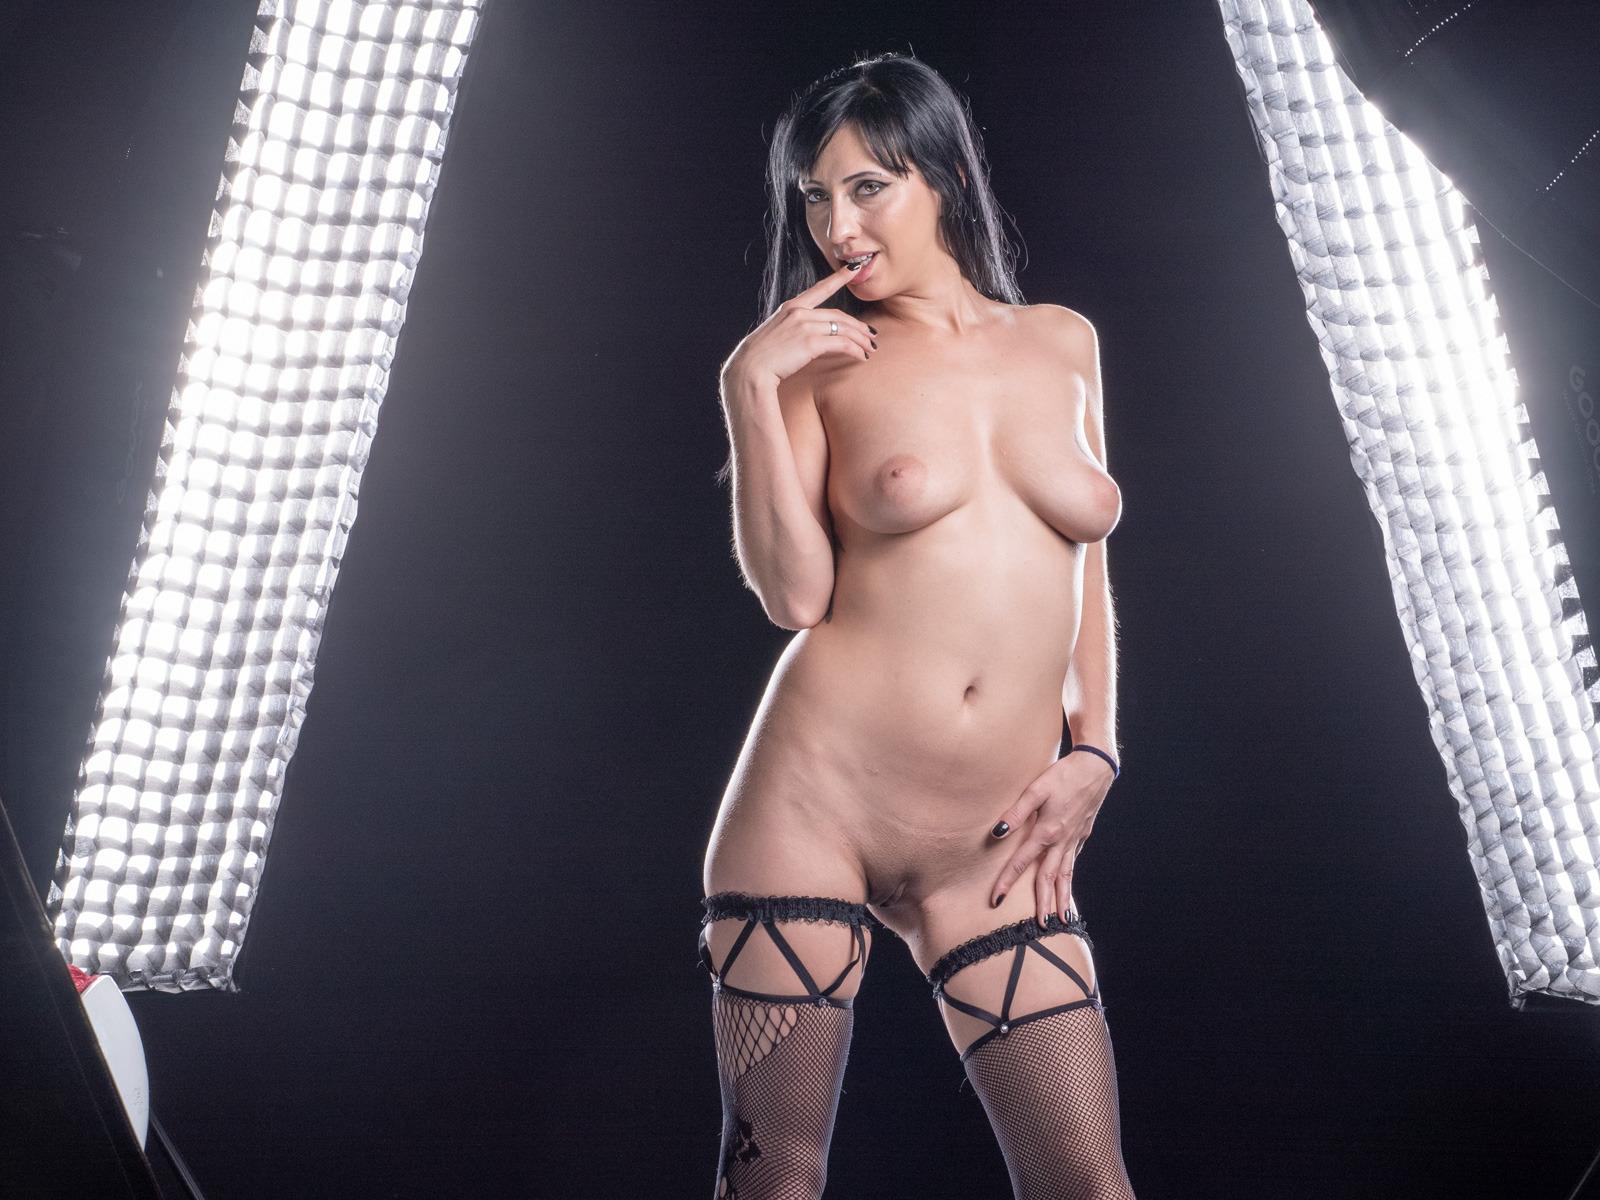 Free celebrity sherry mancino nude realtor ass drunk